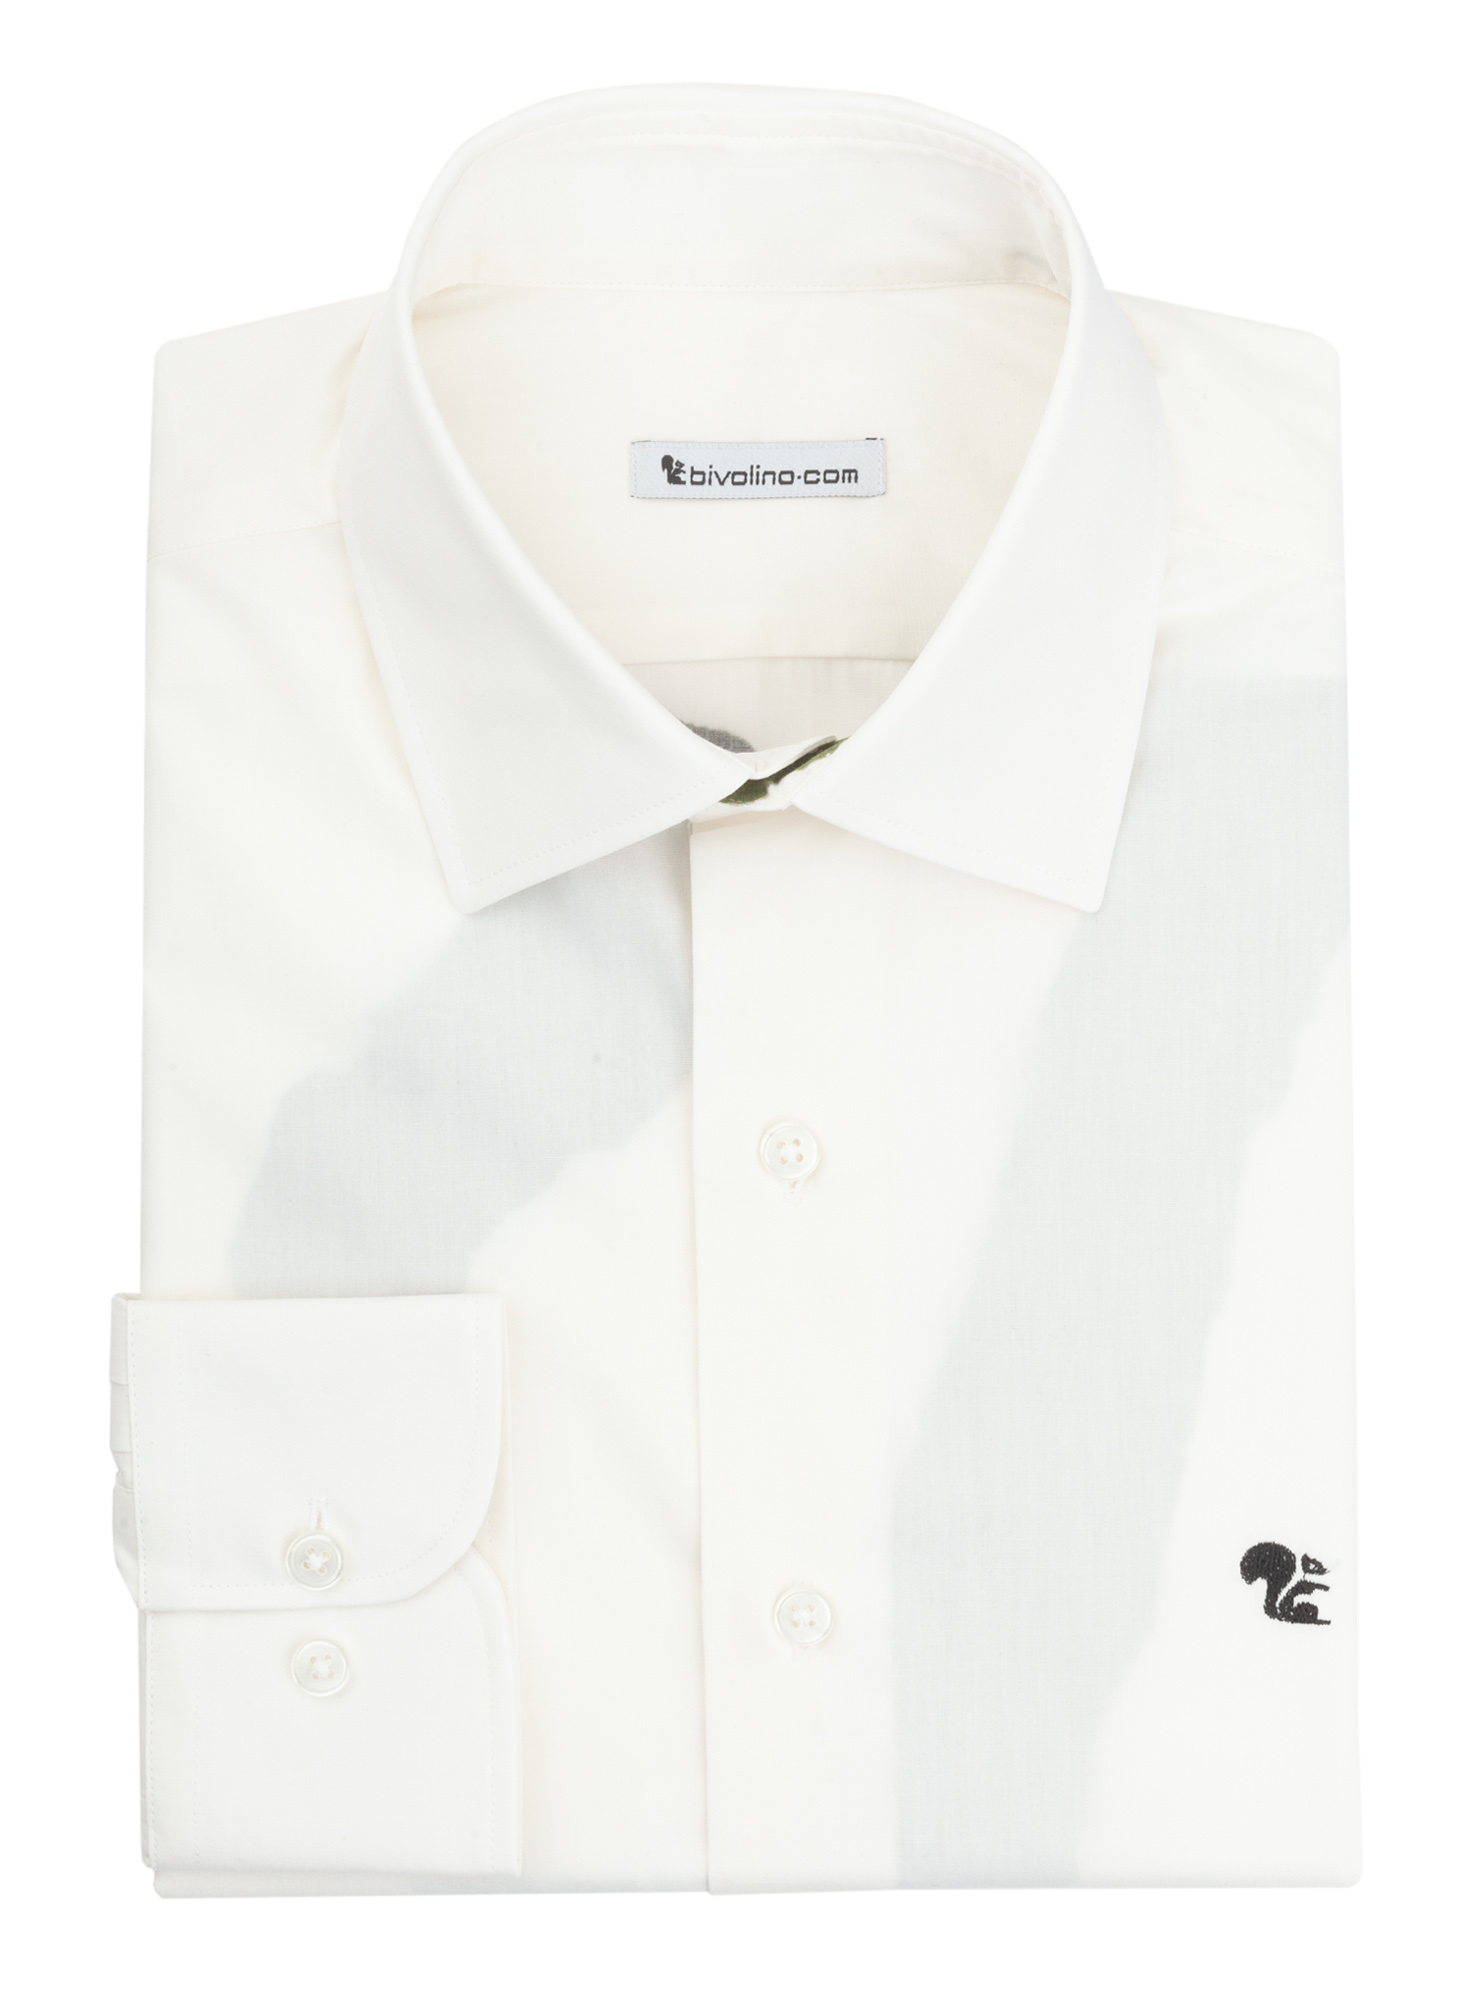 BREISCIA - ARTY-PRINT men shirt - CEES ANDRIESSEN 3